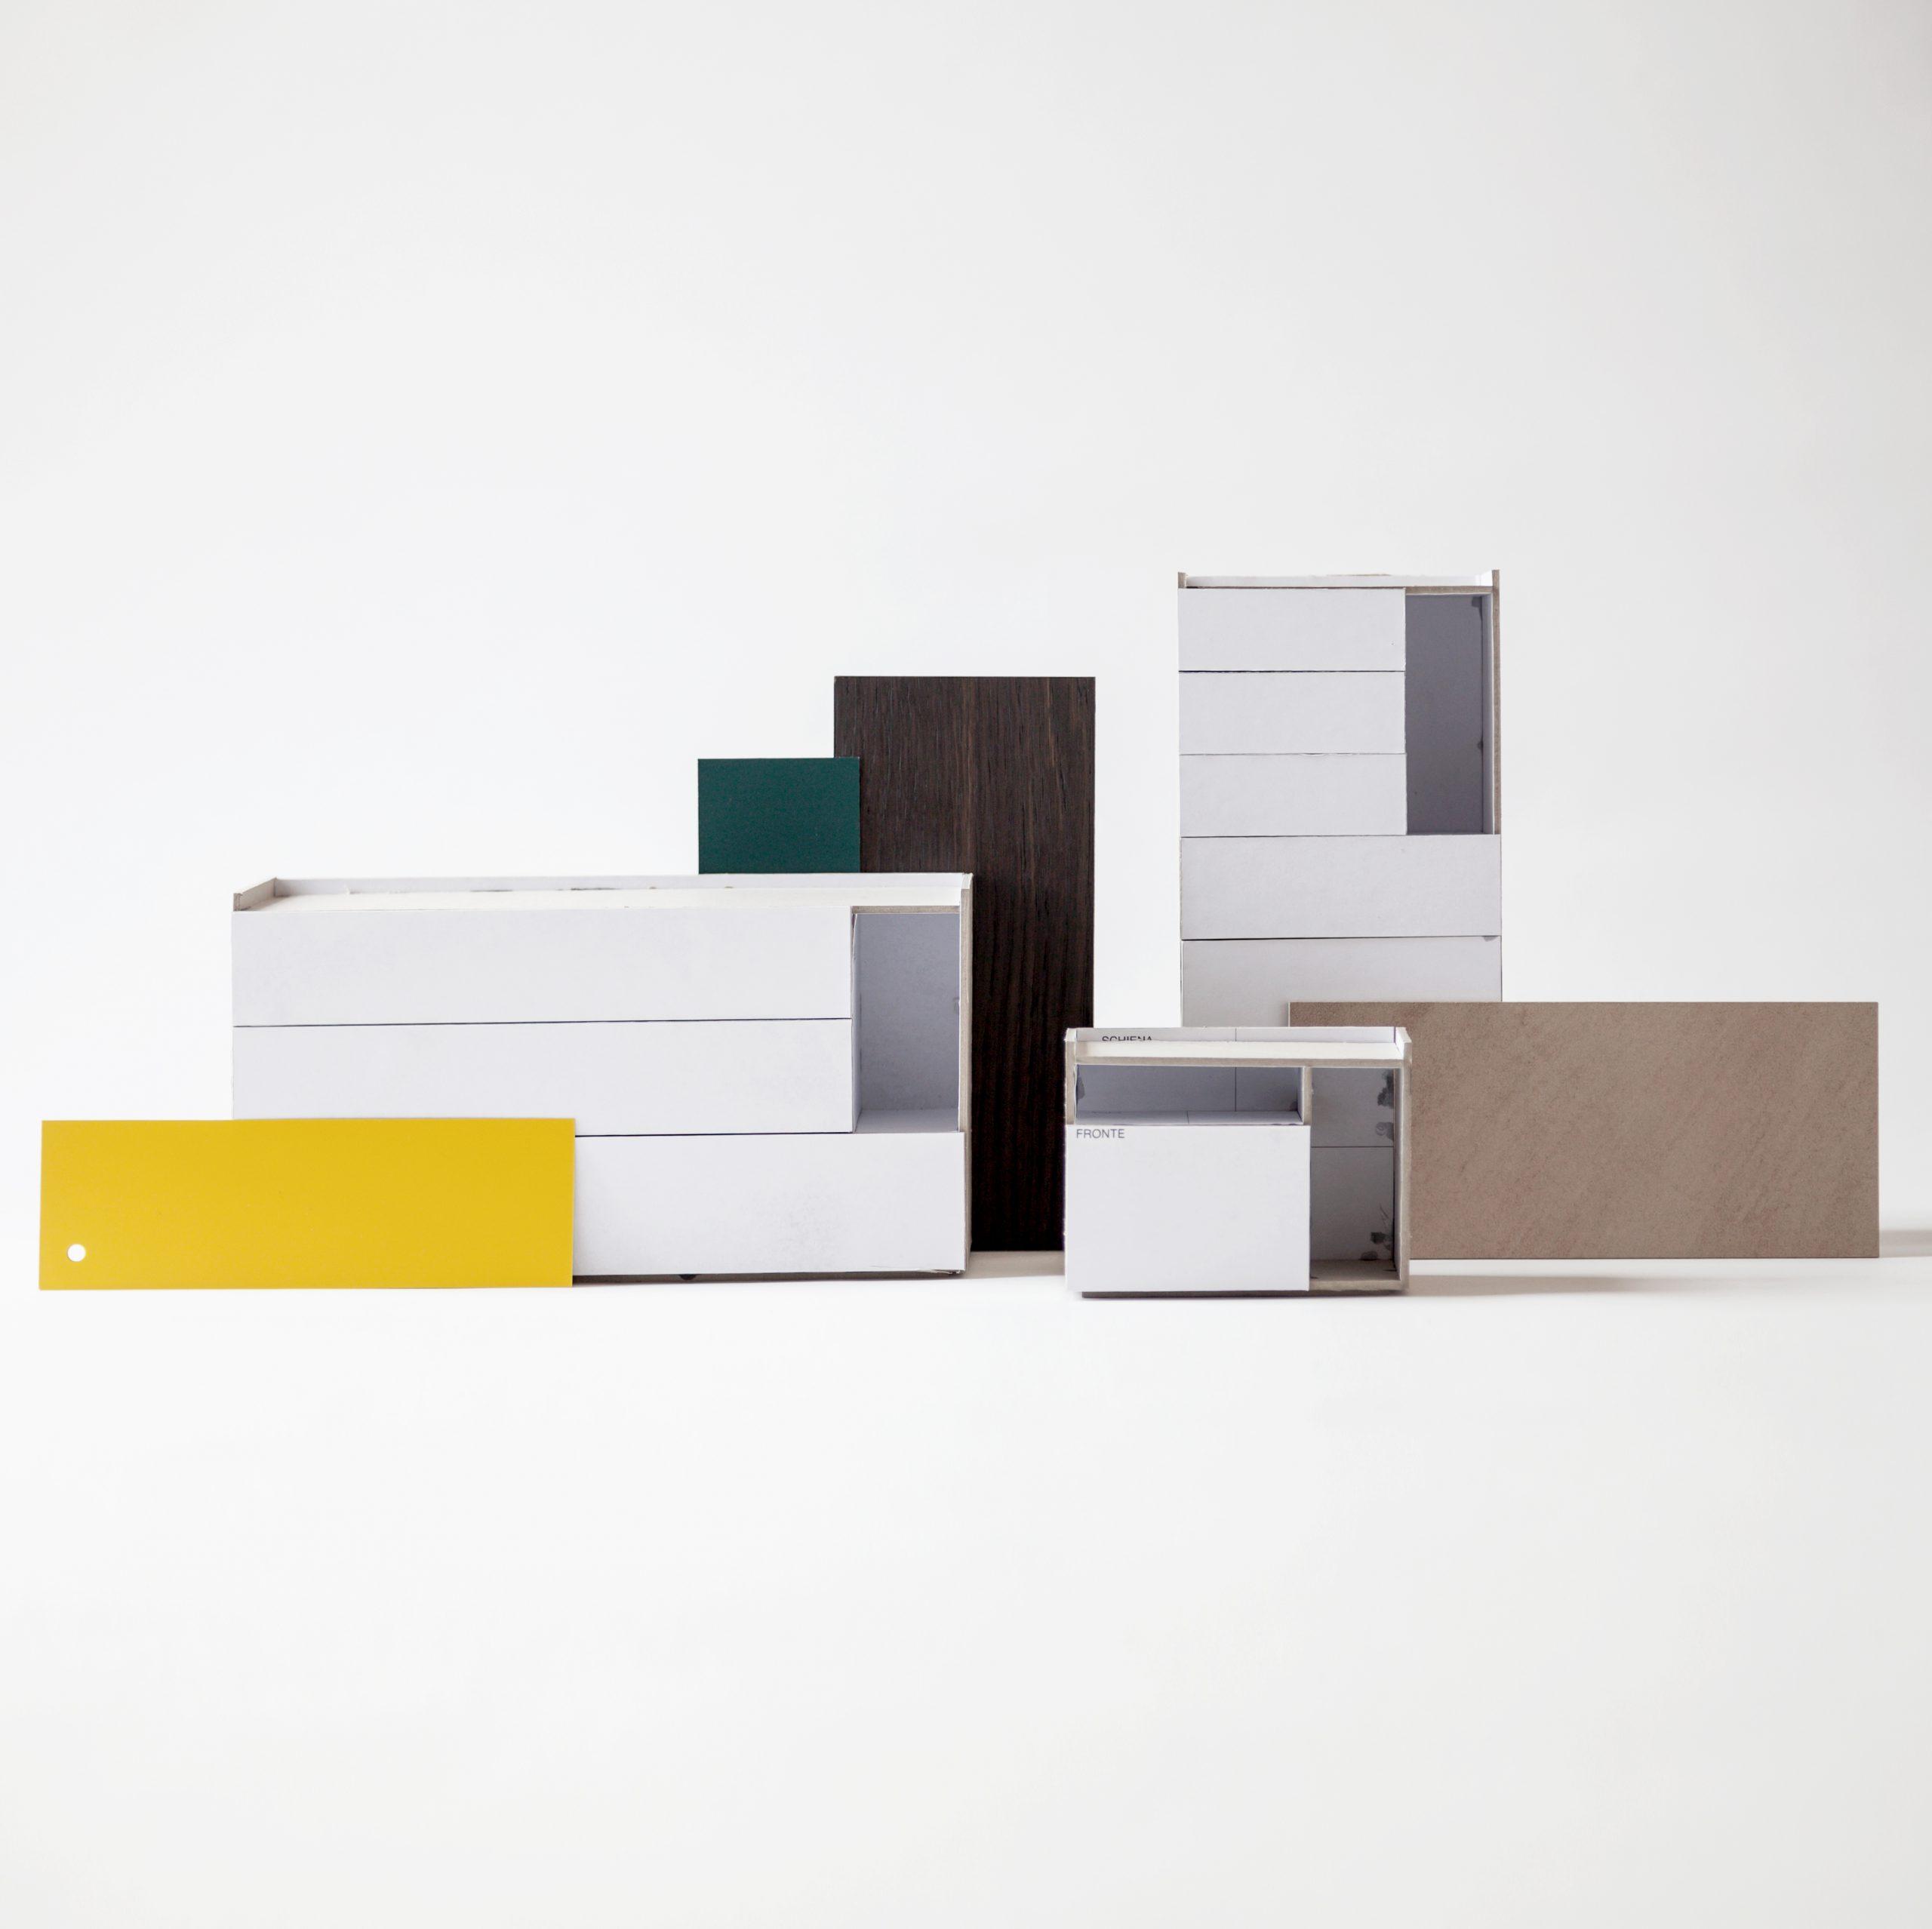 Cardboard mockup of the Tip drawer units by Debiasi Sandri for Lema